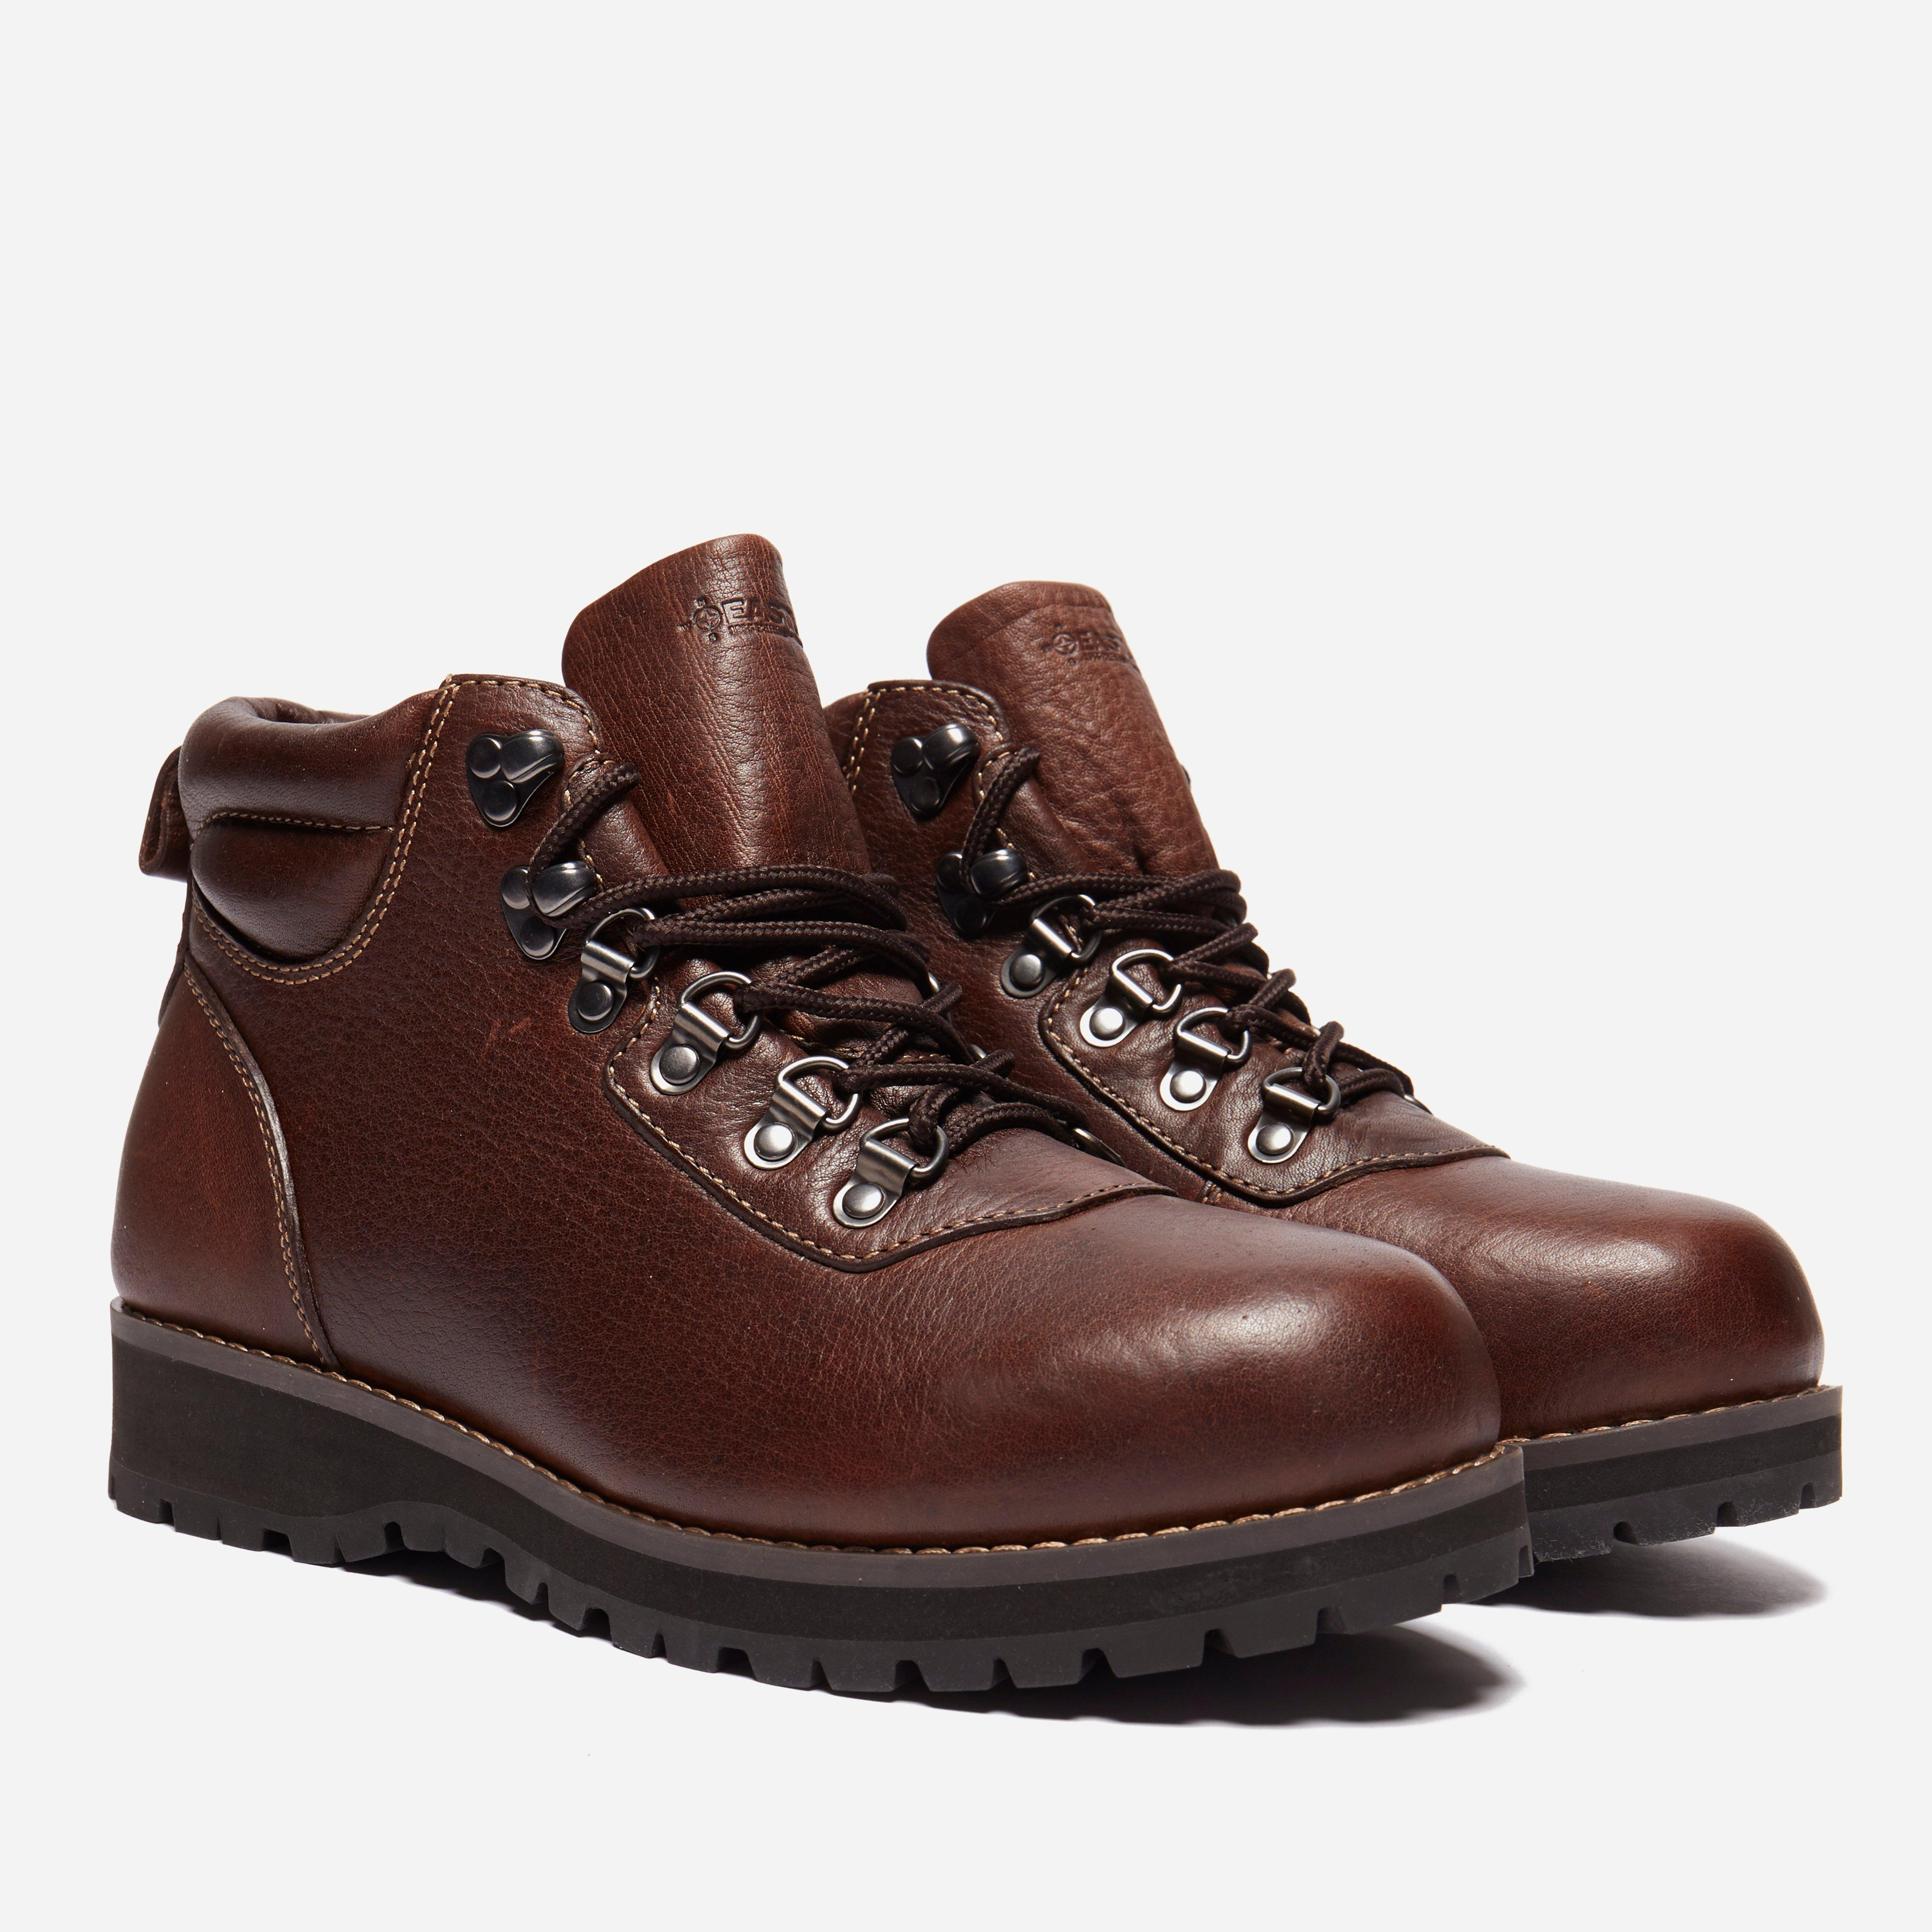 Eastland Max 1955 Boot